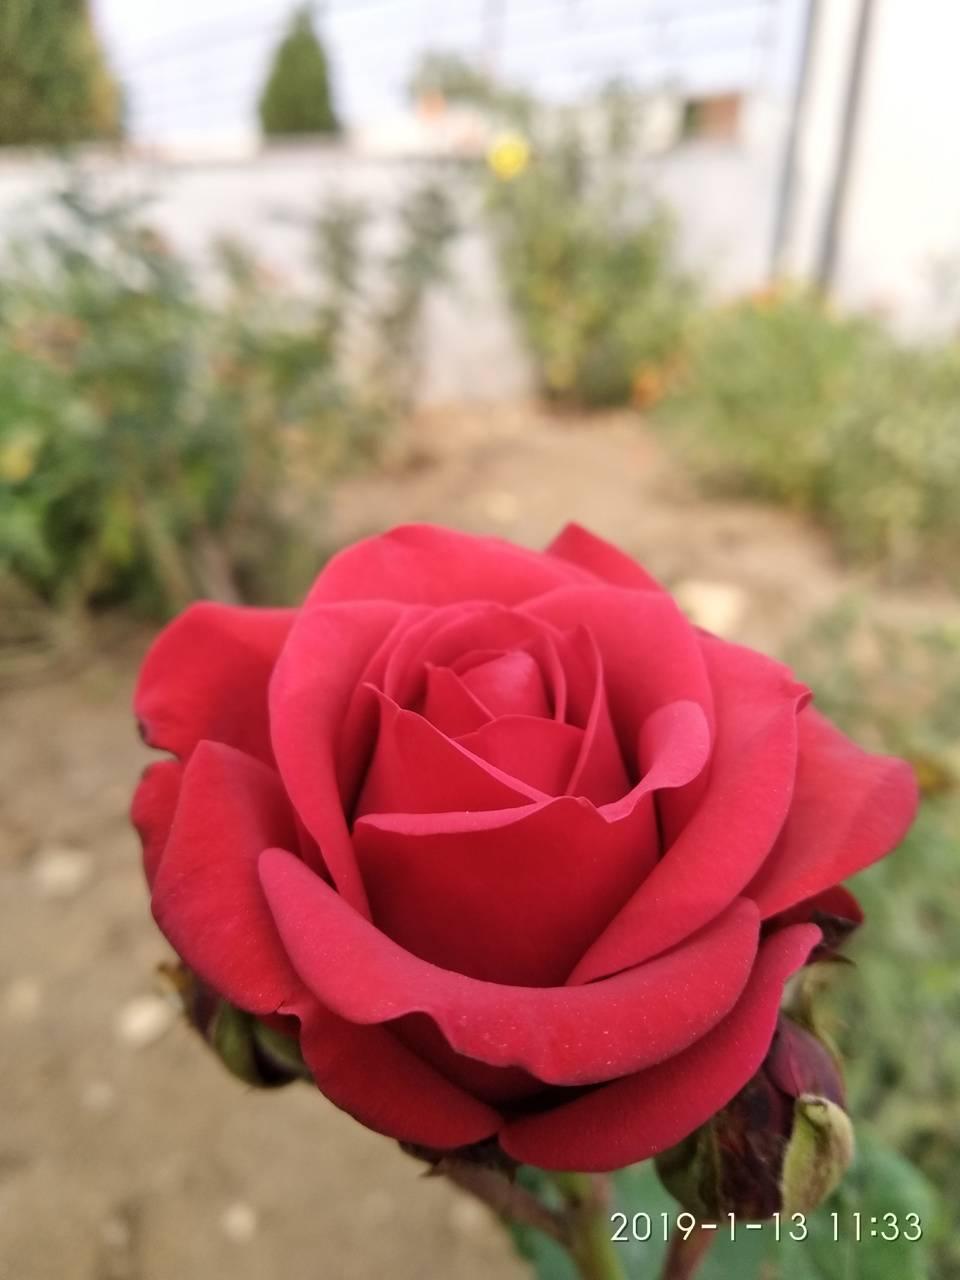 Rose MS